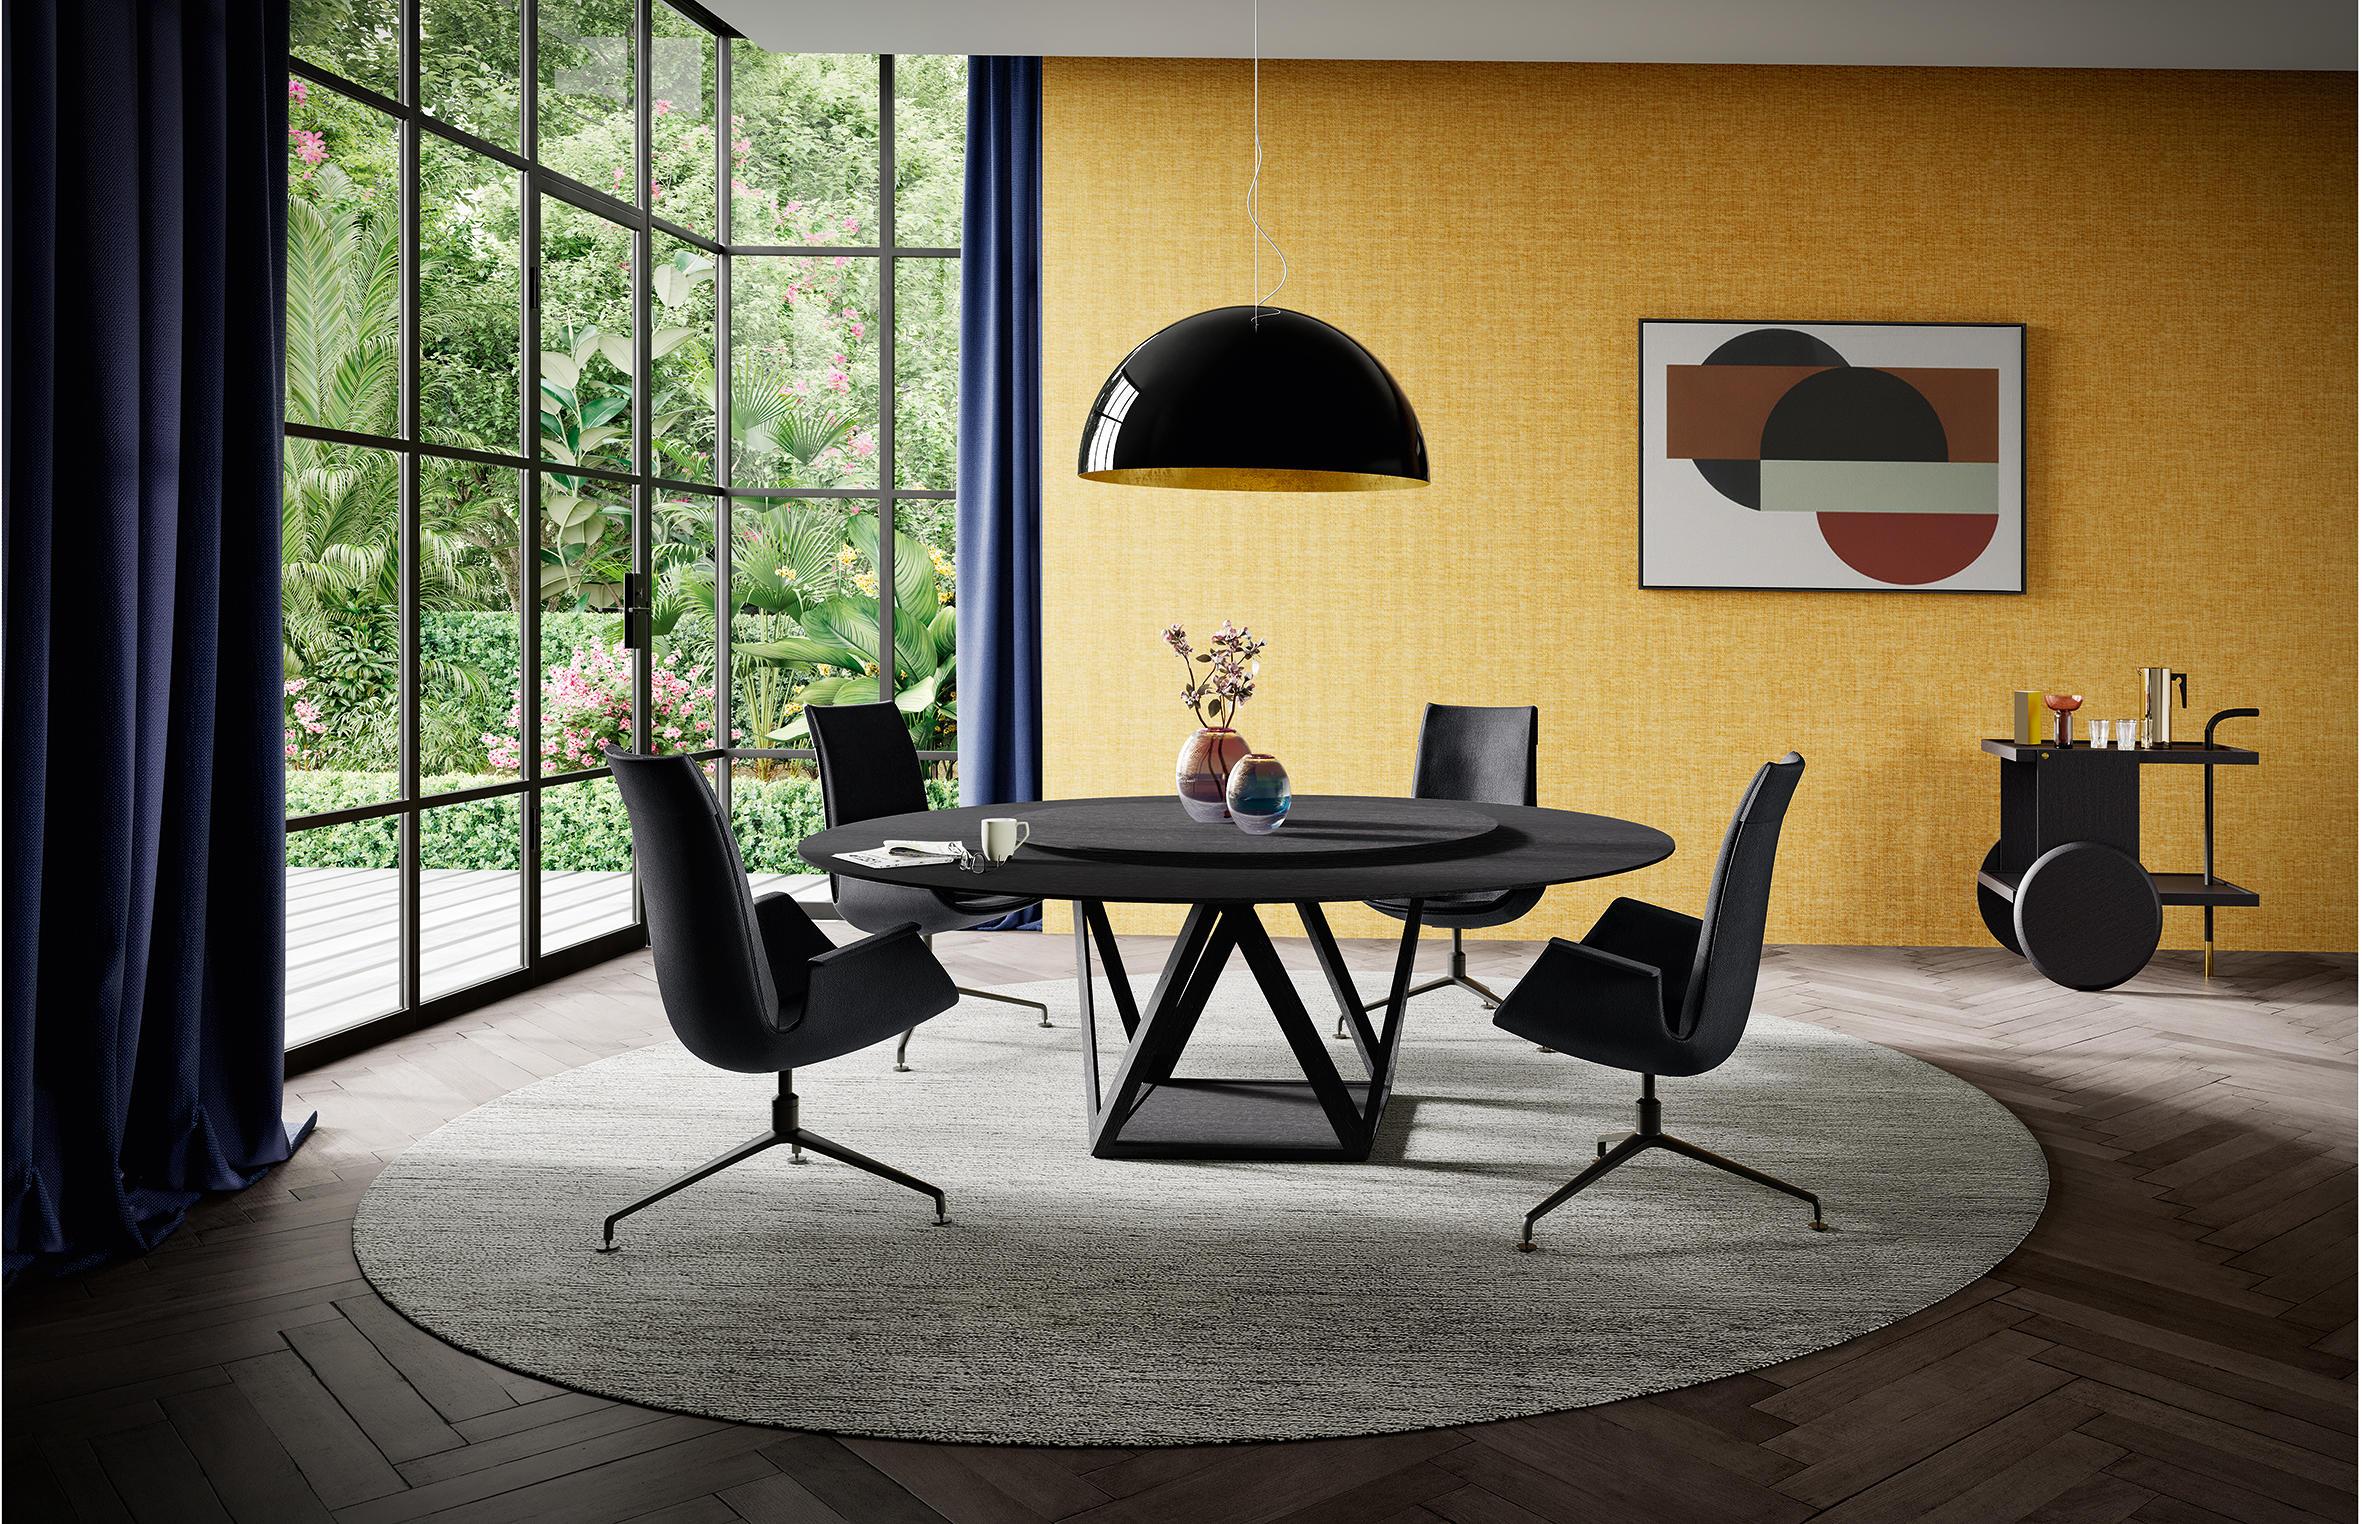 fk 6725 schalensessel st hle von walter knoll architonic. Black Bedroom Furniture Sets. Home Design Ideas